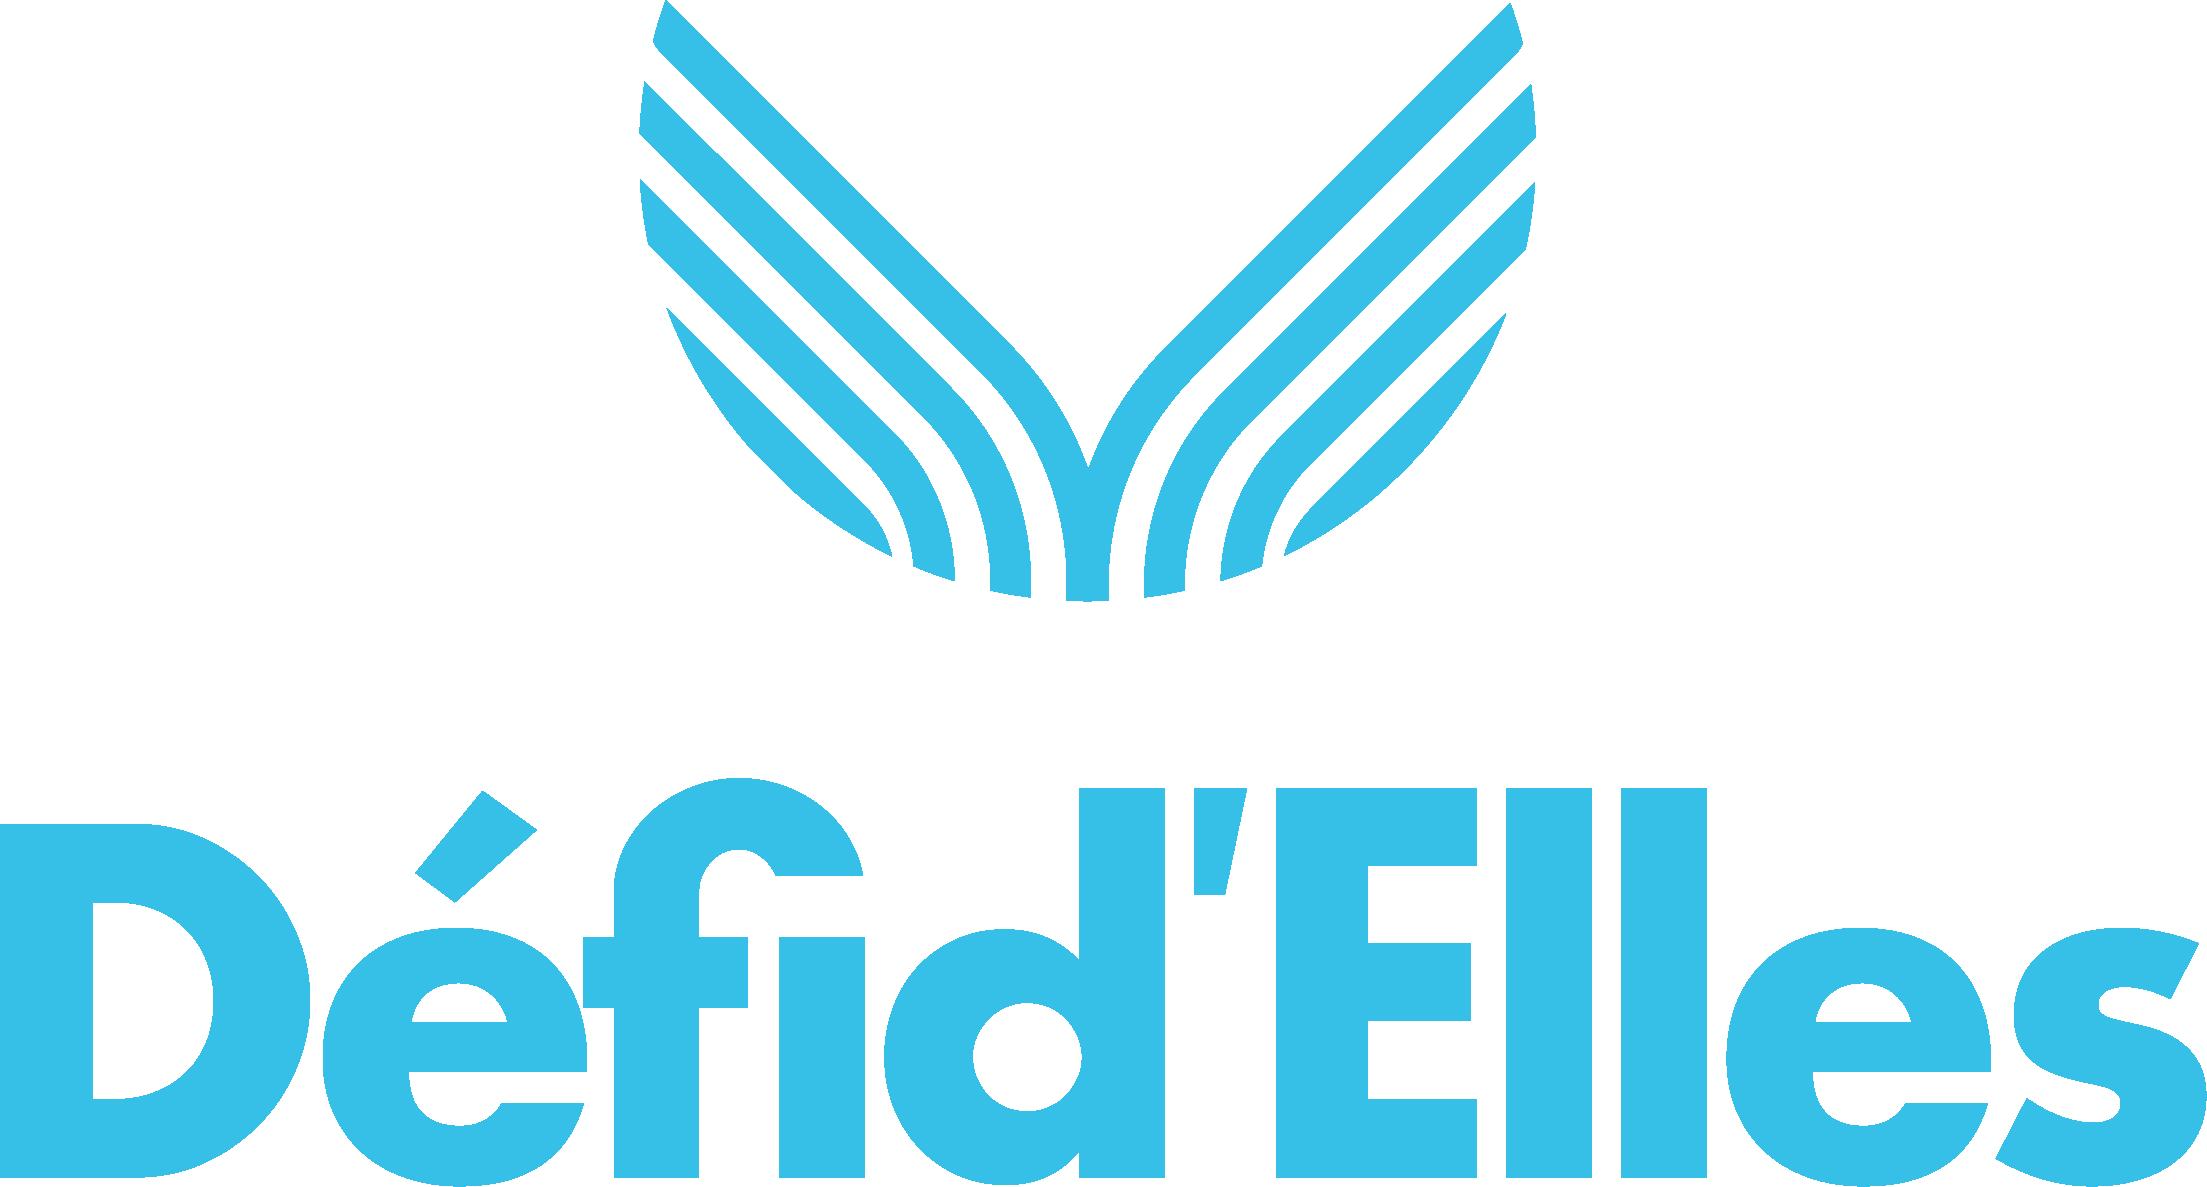 DFD_Logotype_vertical_Bleu_RVB_150_dpi.png